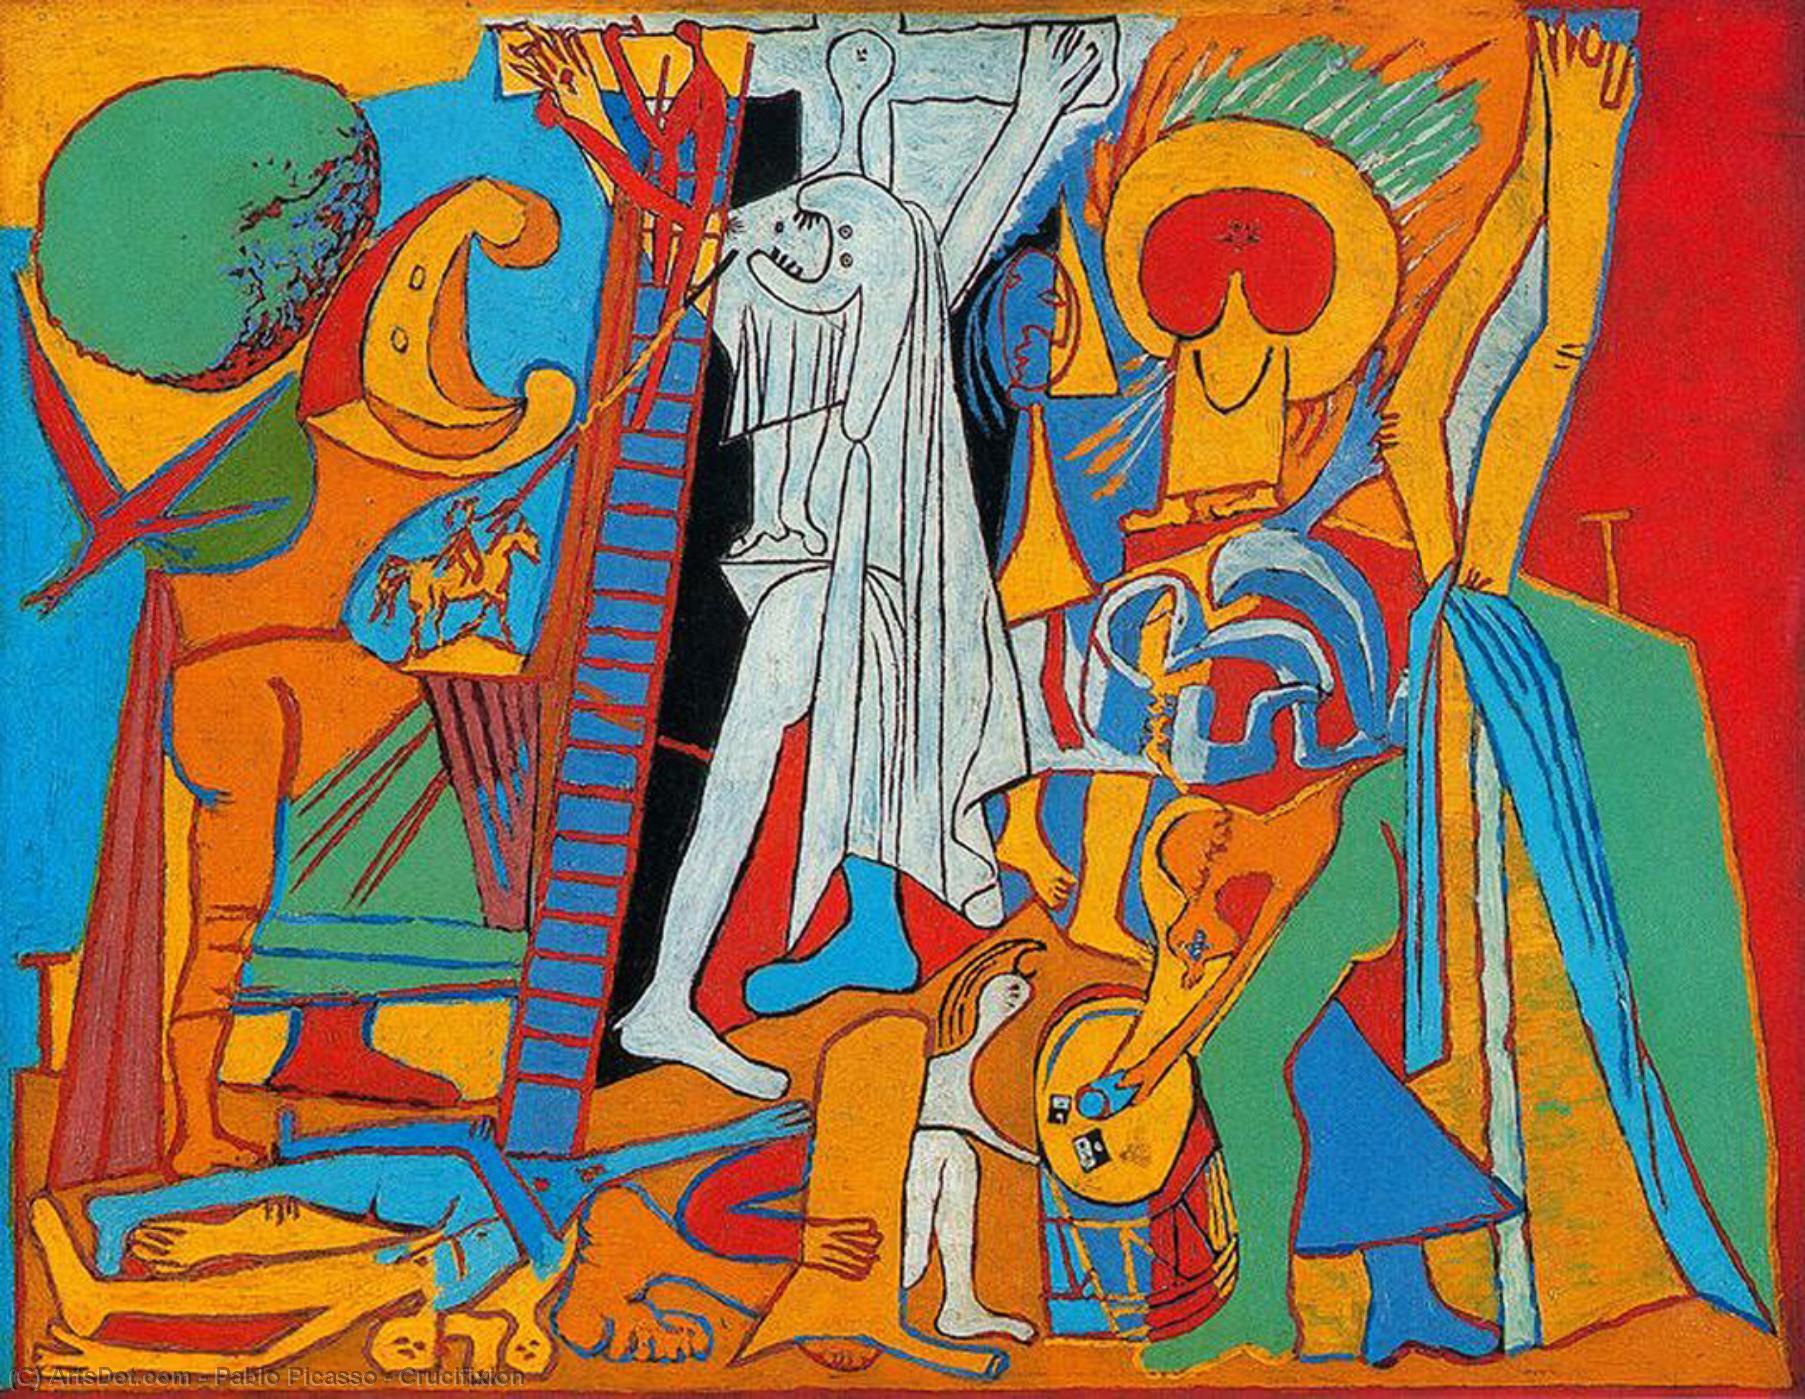 WikiOO.org - Güzel Sanatlar Ansiklopedisi - Resim, Resimler Pablo Picasso - Crucifixion